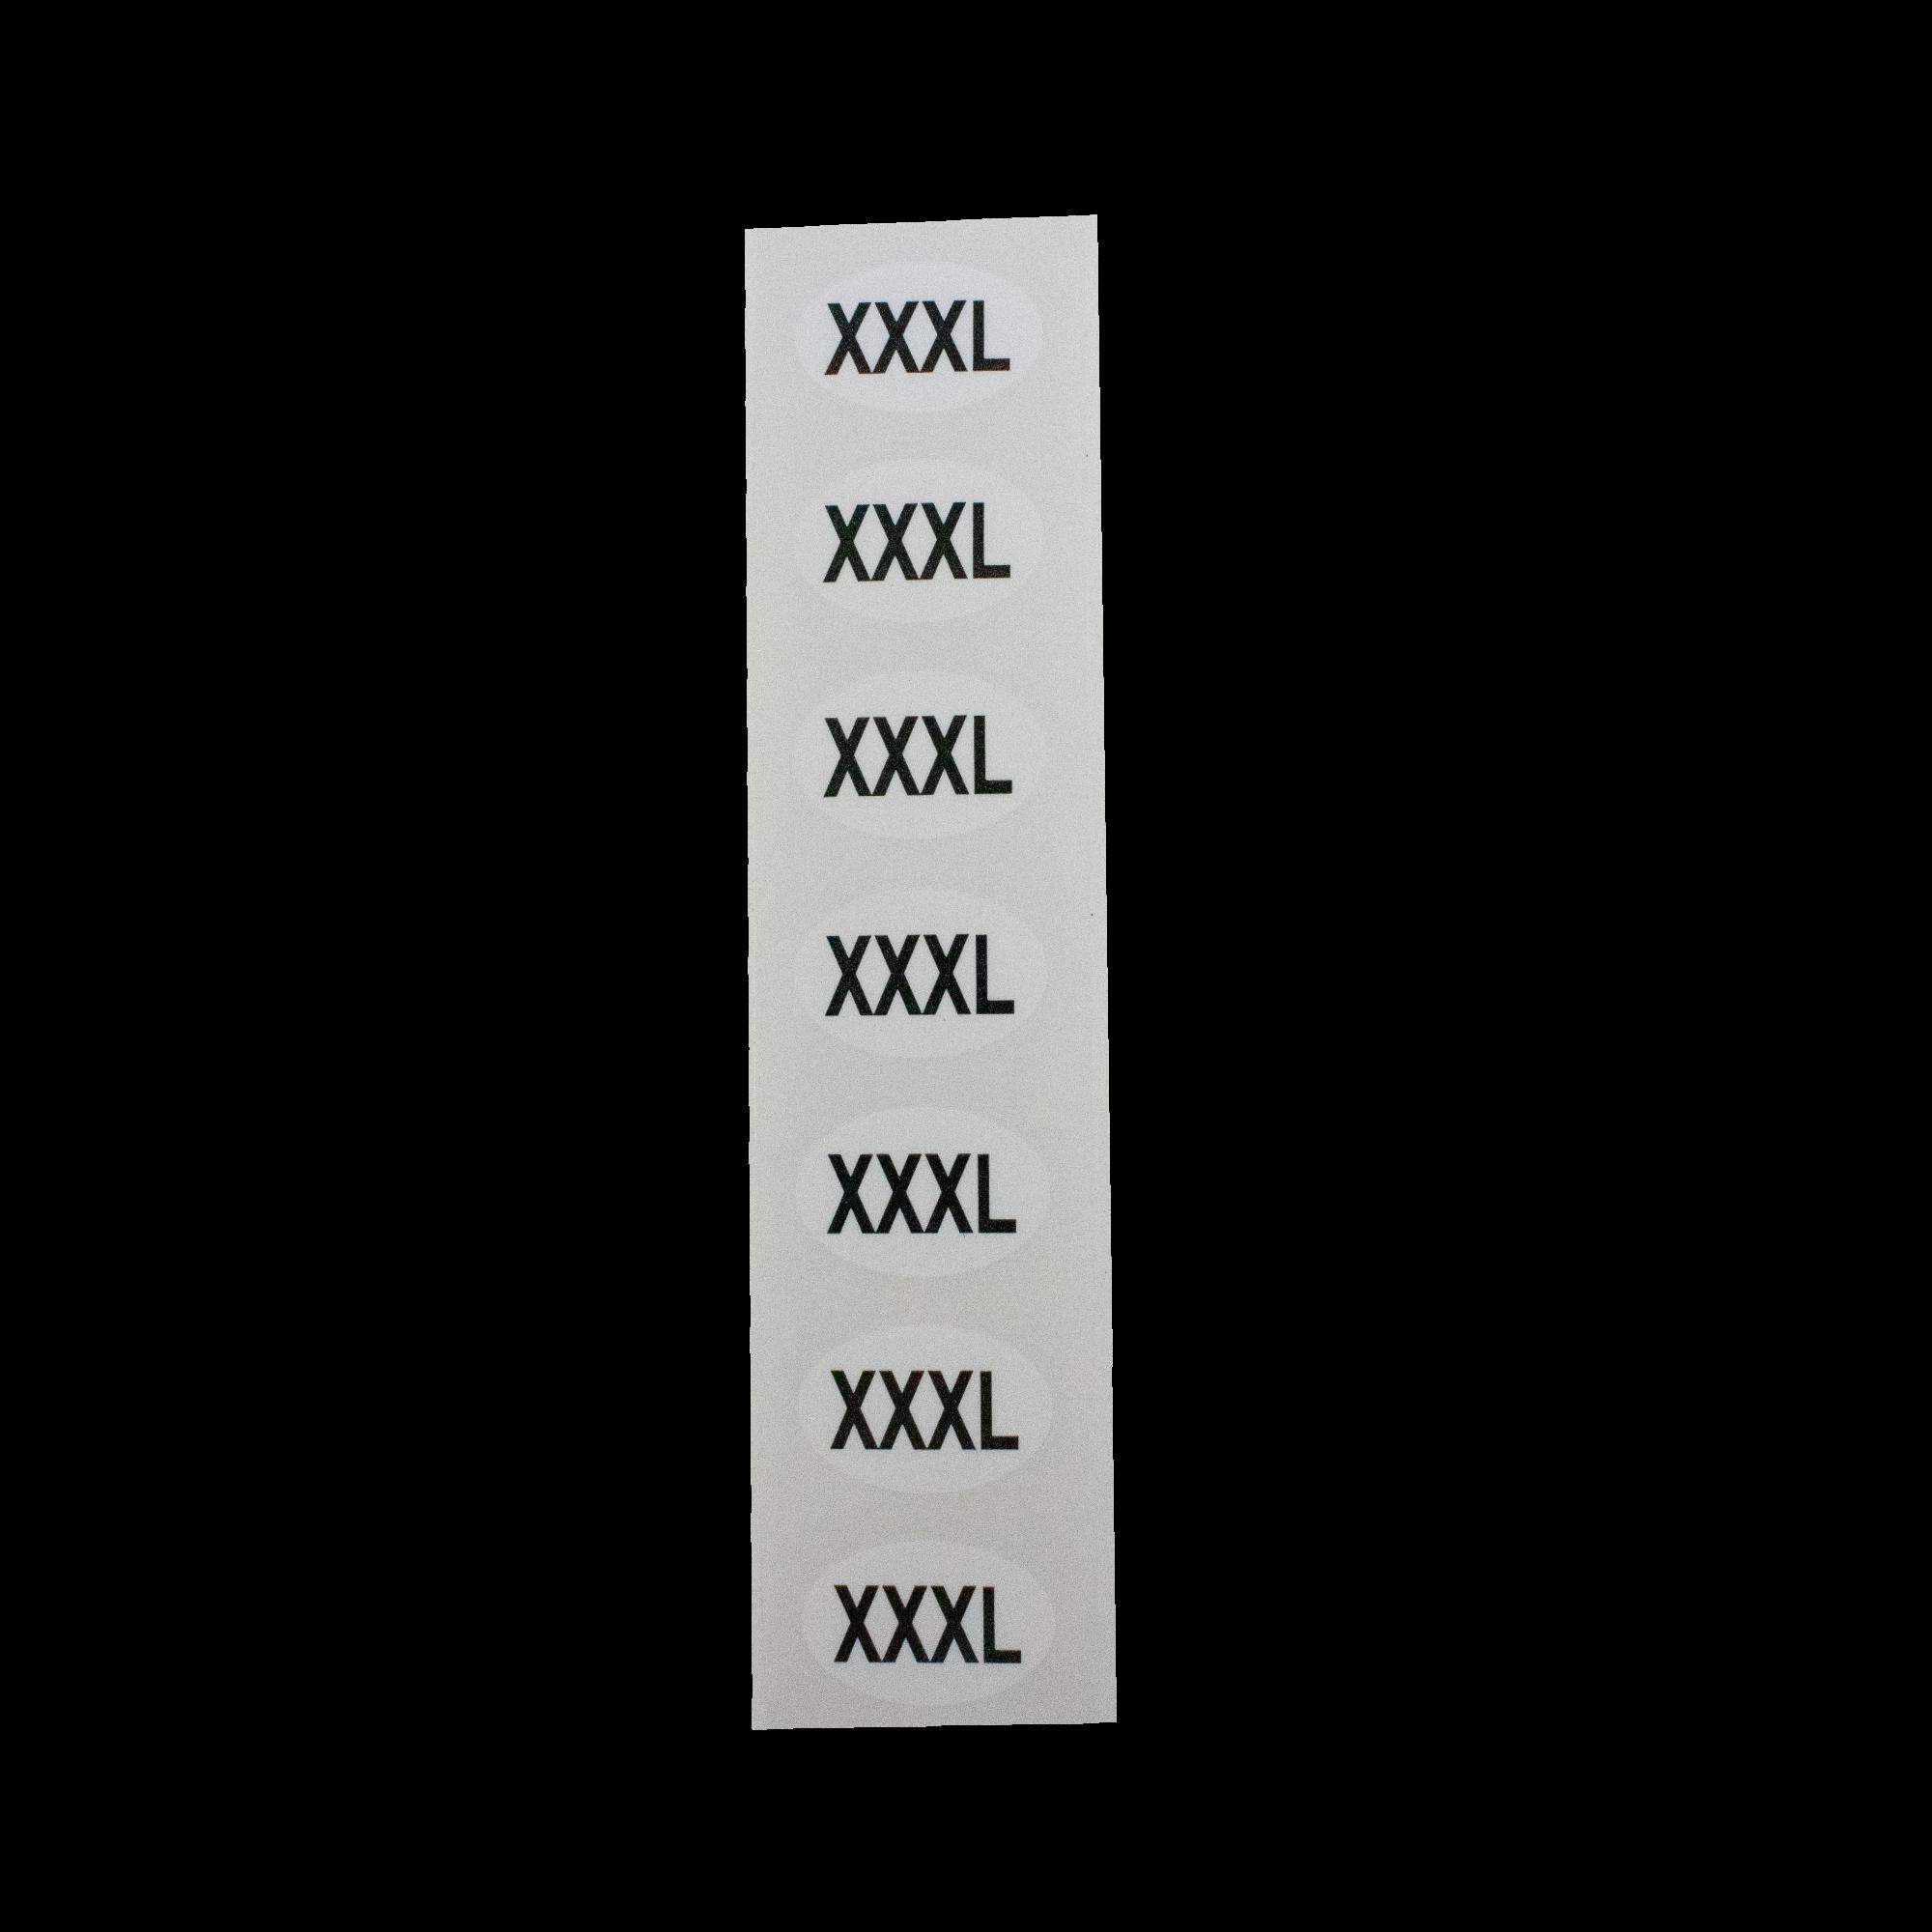 xxxl.png